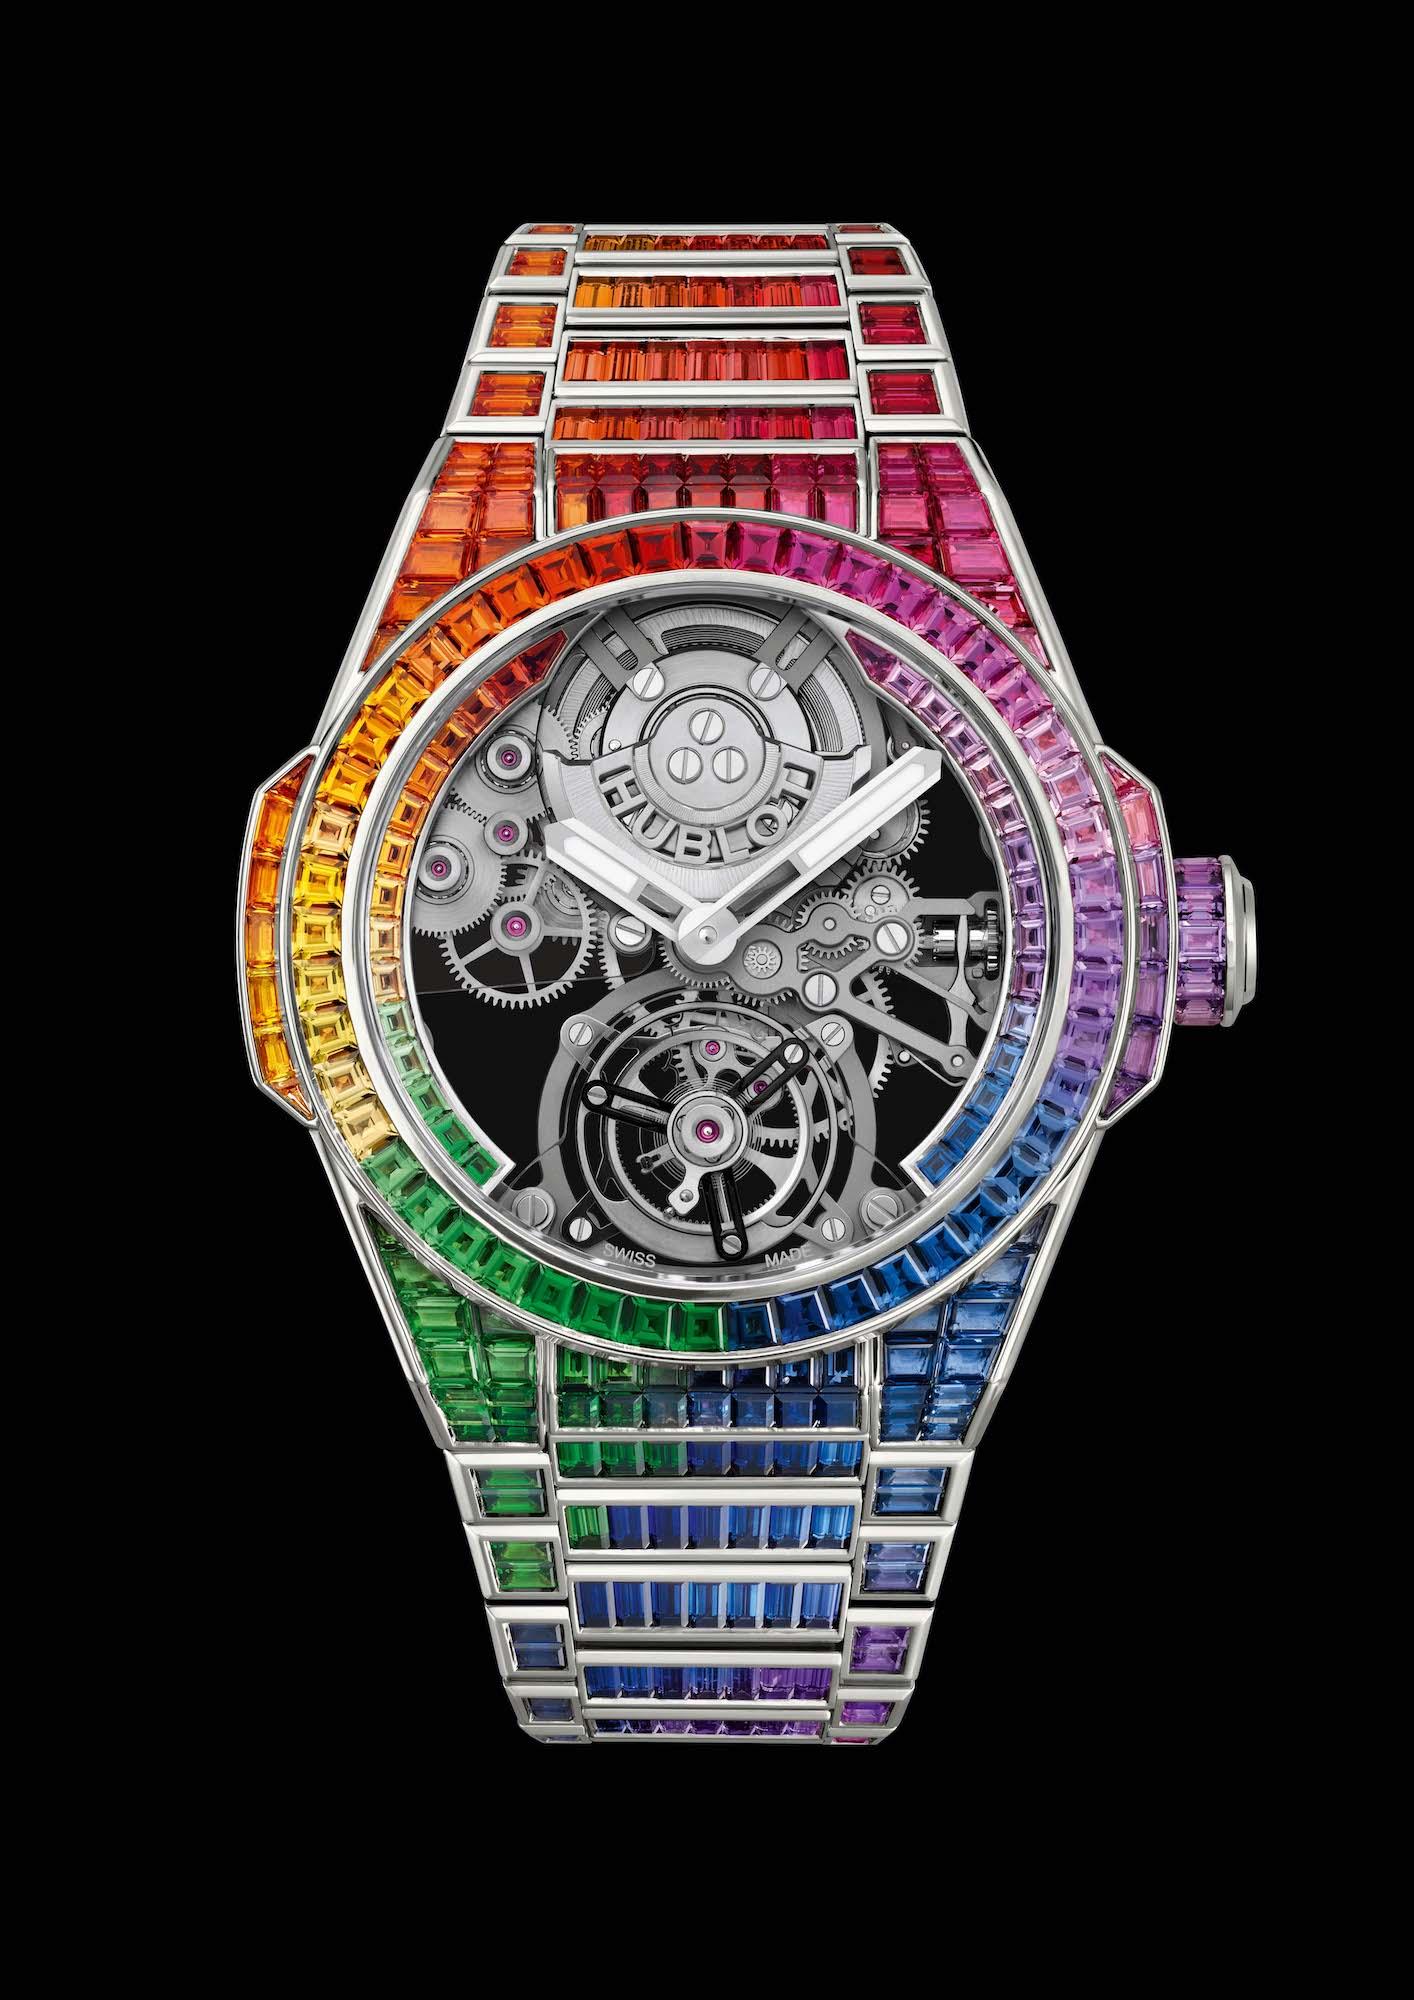 Hublot Big Bang Integral Tourbillon Rainbow 455.WX.9900.WX.9999 Frontal fondo negro